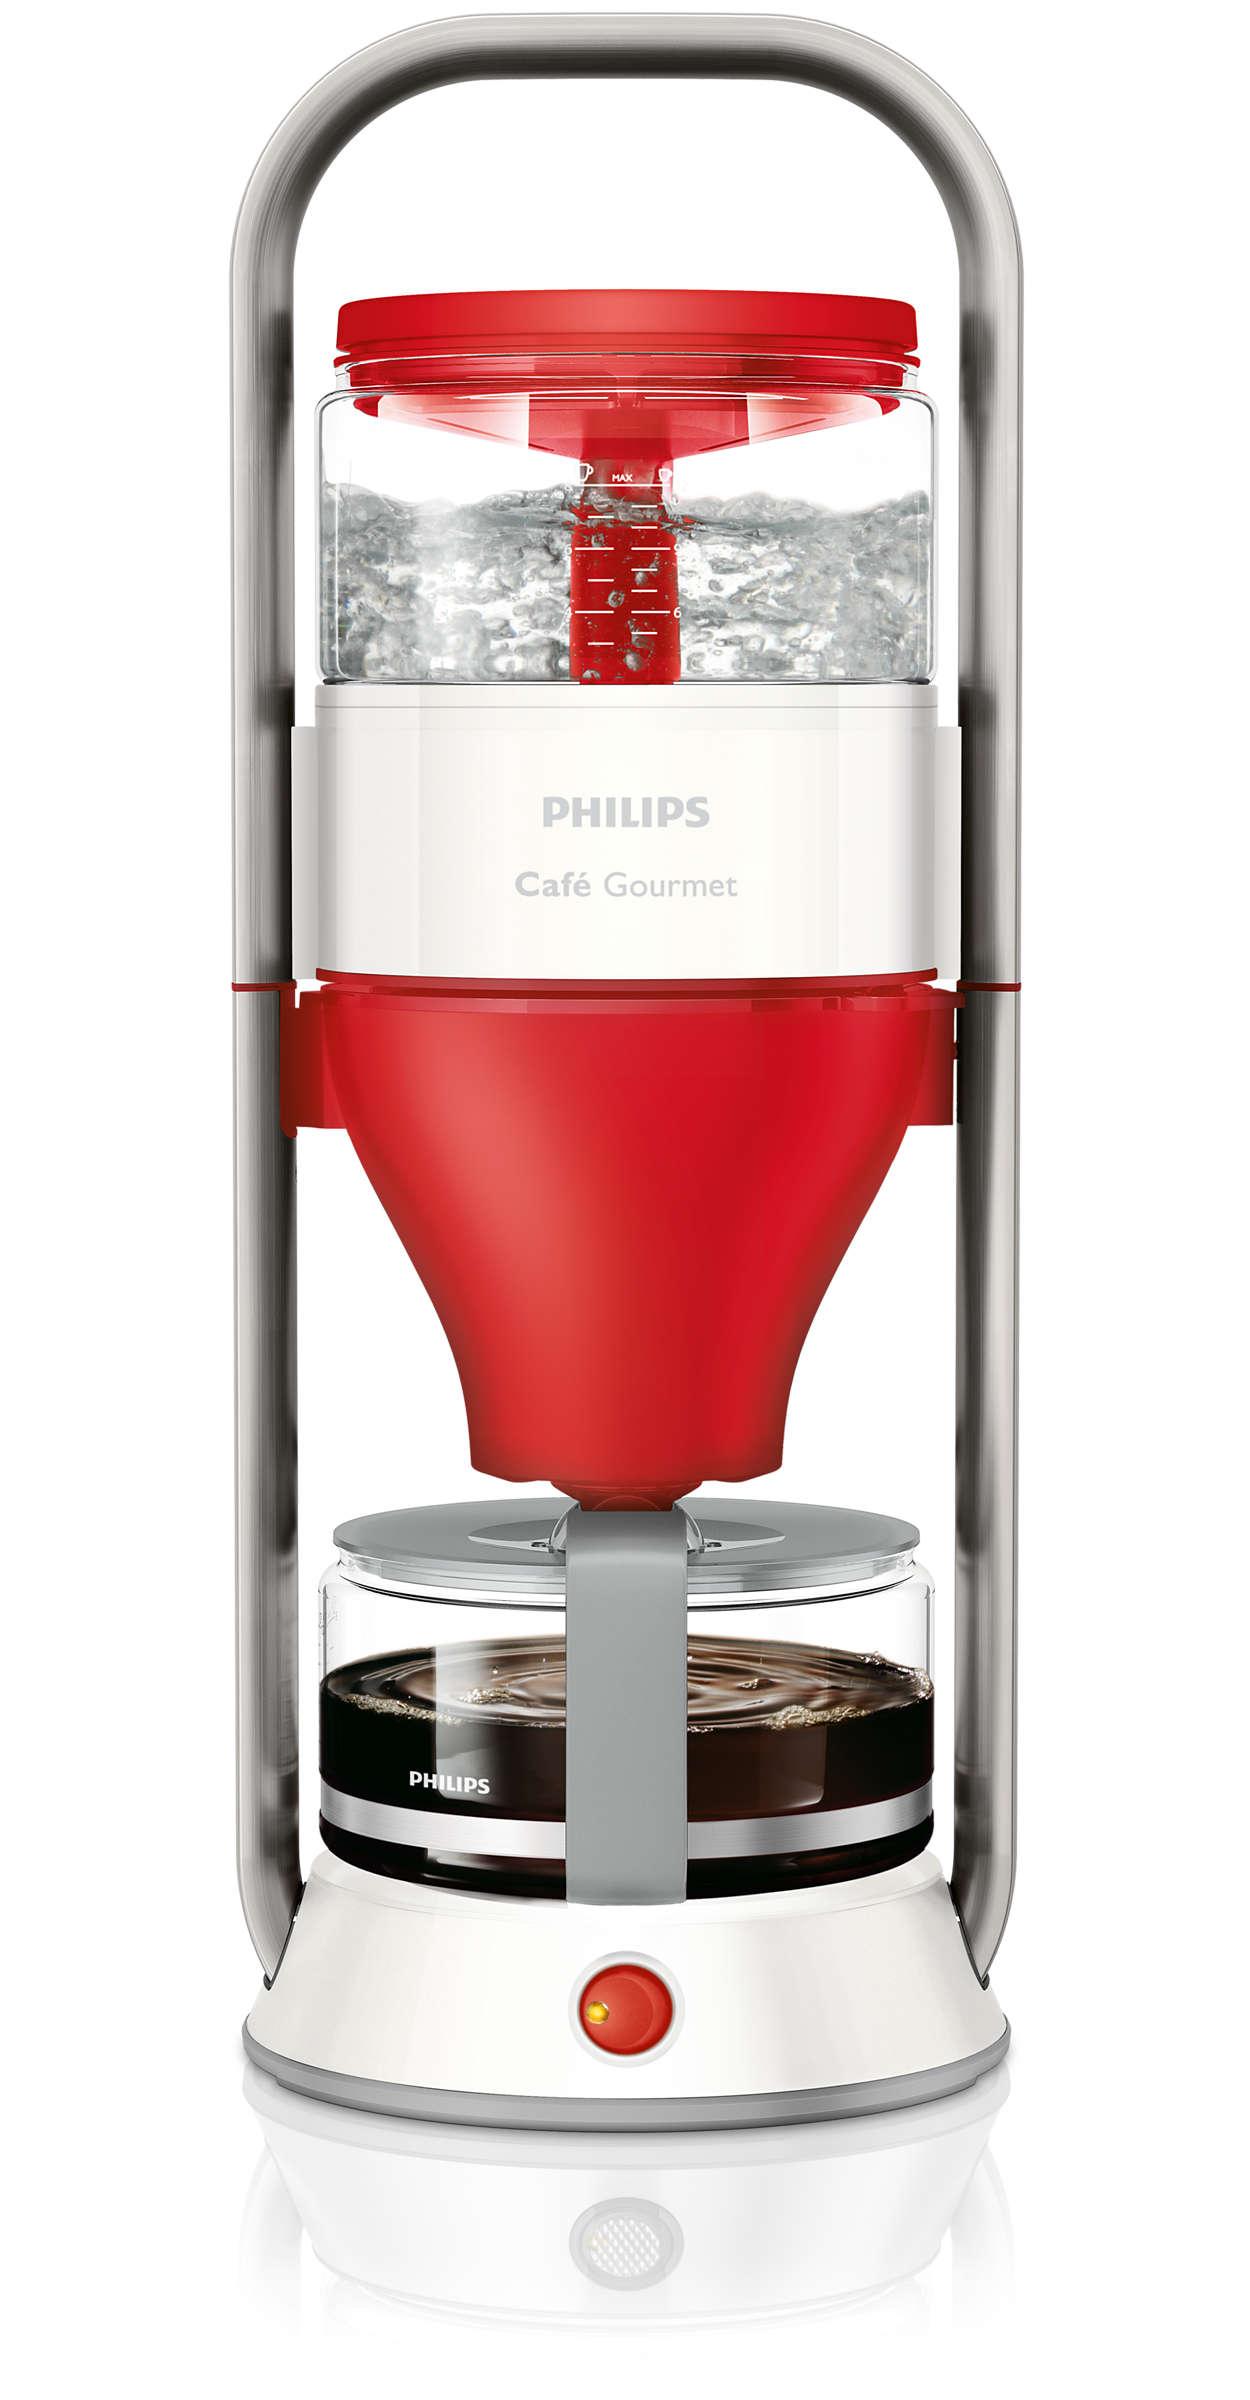 caf gourmet kaffeemaschine hd5407 80 philips. Black Bedroom Furniture Sets. Home Design Ideas